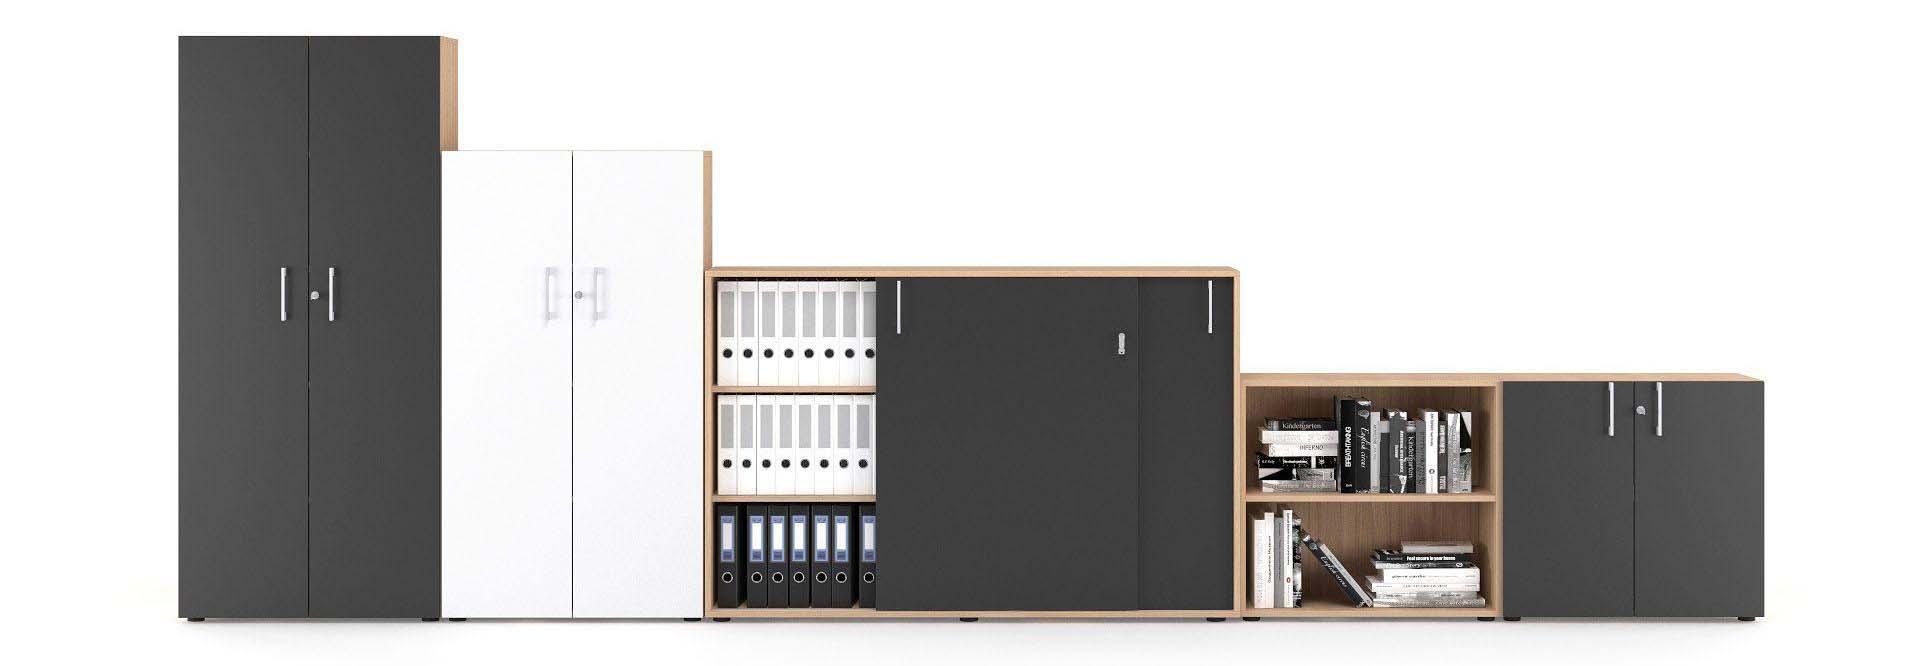 Storage-cabinets-NOVA-Narbutas-1-1920x864